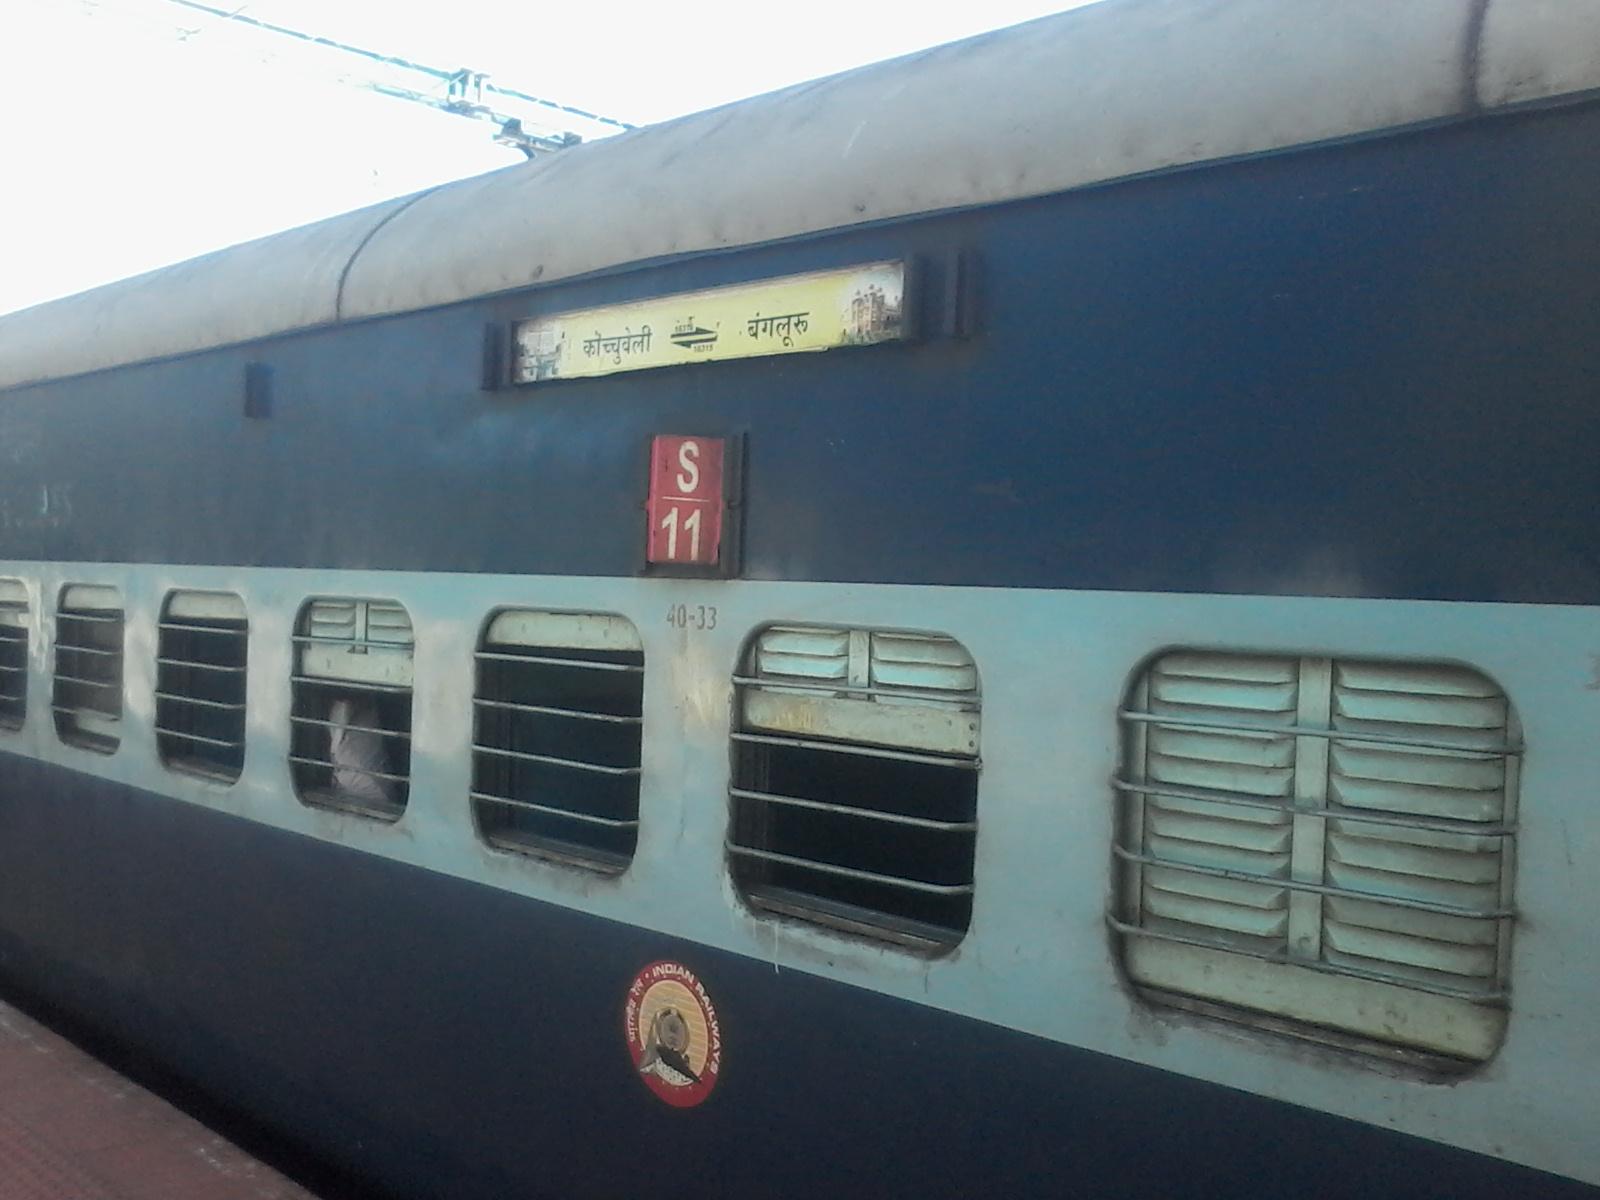 The Kochuvelli Express